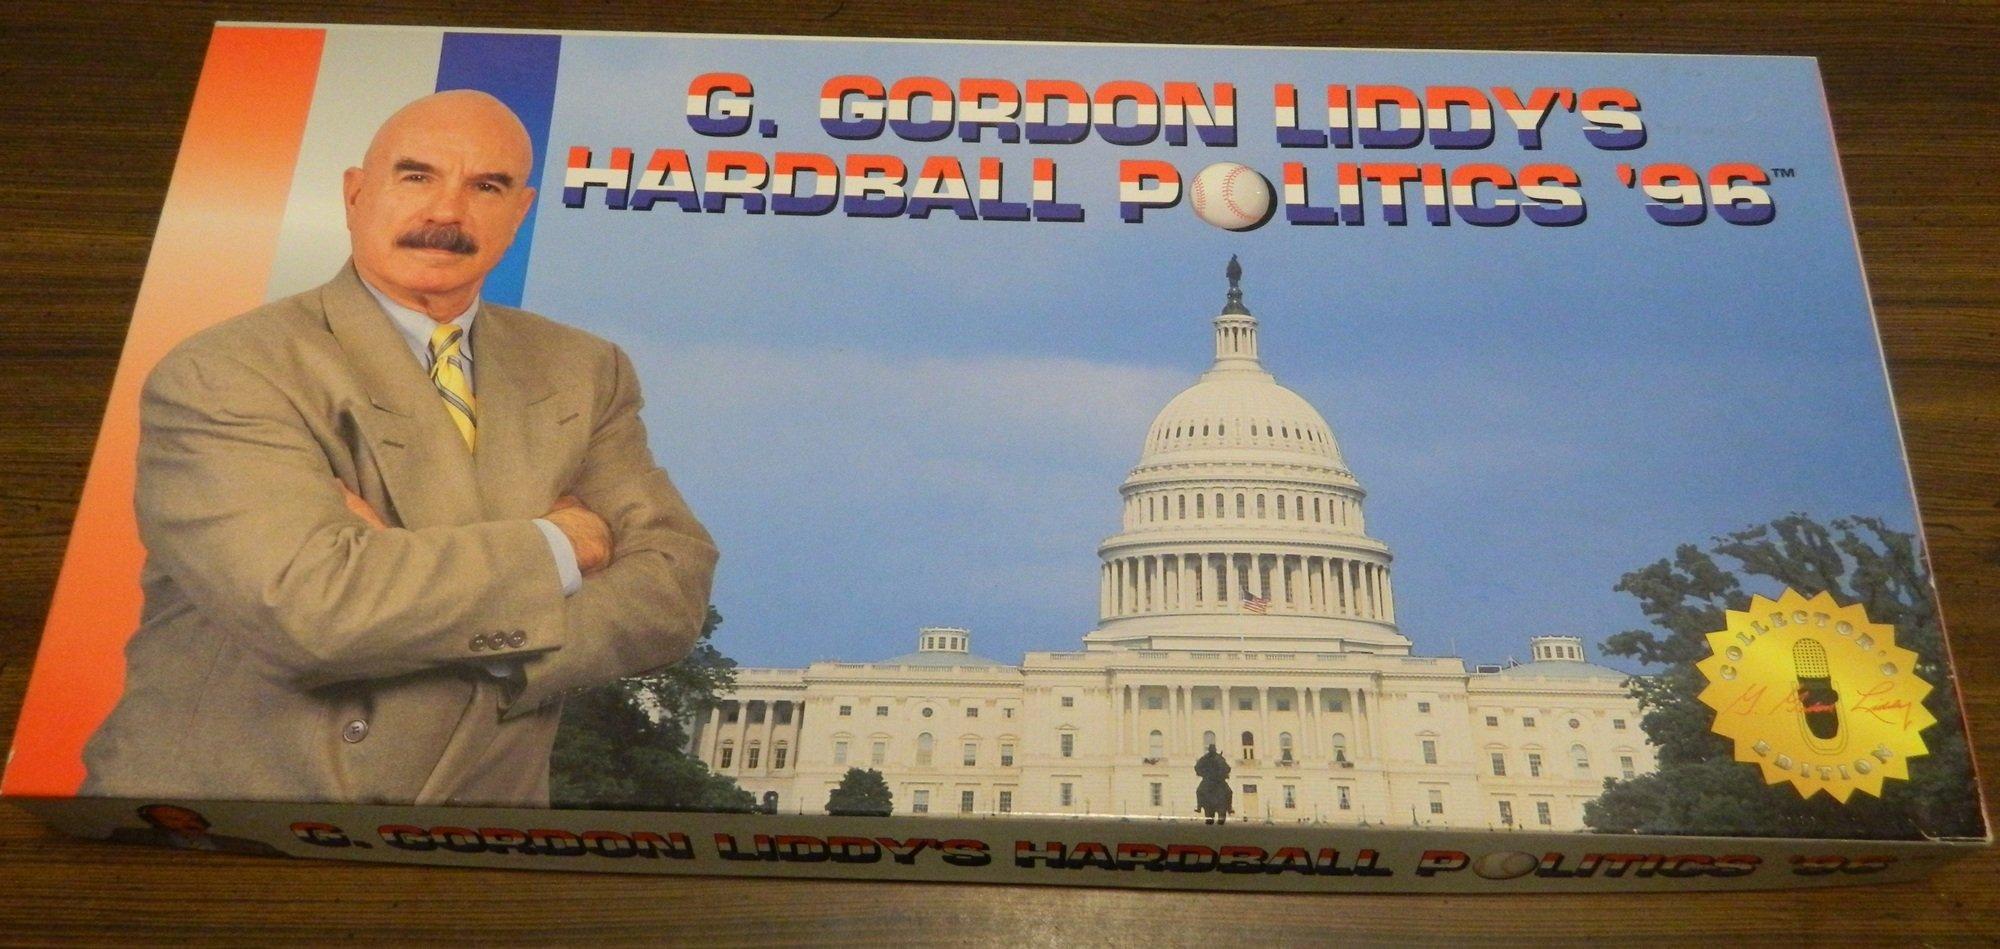 Box for G Gordon Liddy's Harball Politics '96